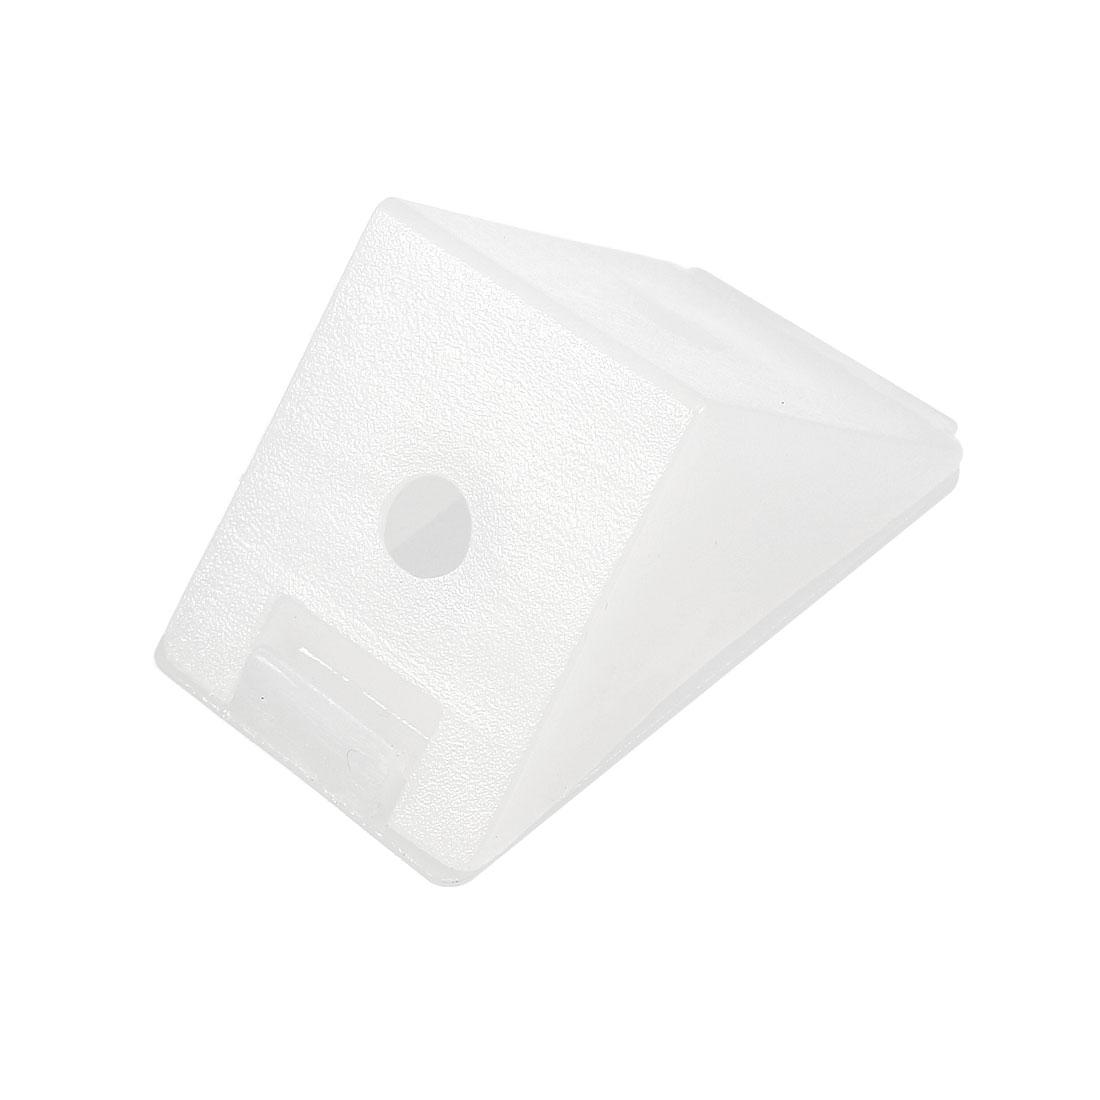 Shelf Cabinet Plastic Corner Braces 2 Holes Angle Brackets w Cover Cap, 20 Pcs